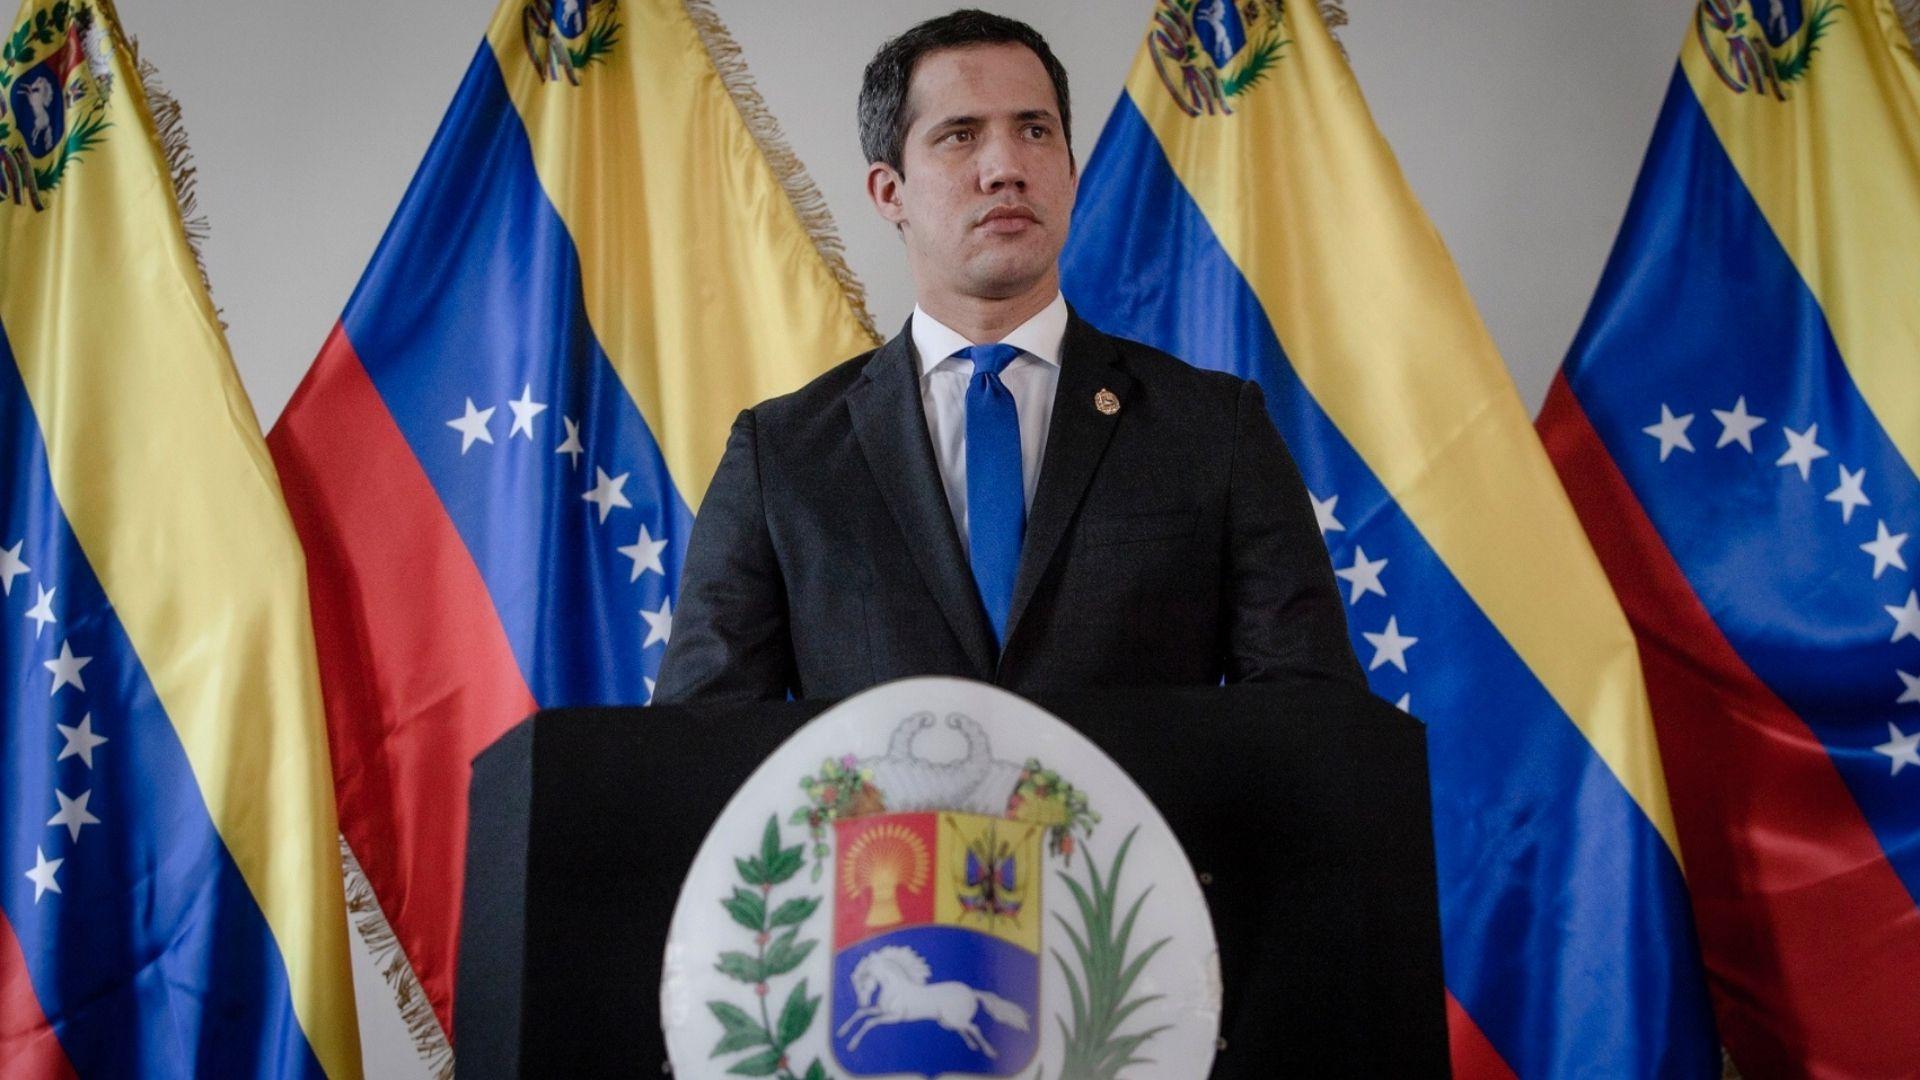 Contraloría inhabilita a Guaidó y a otros 27 exdiputados para ejercer cargos públicos